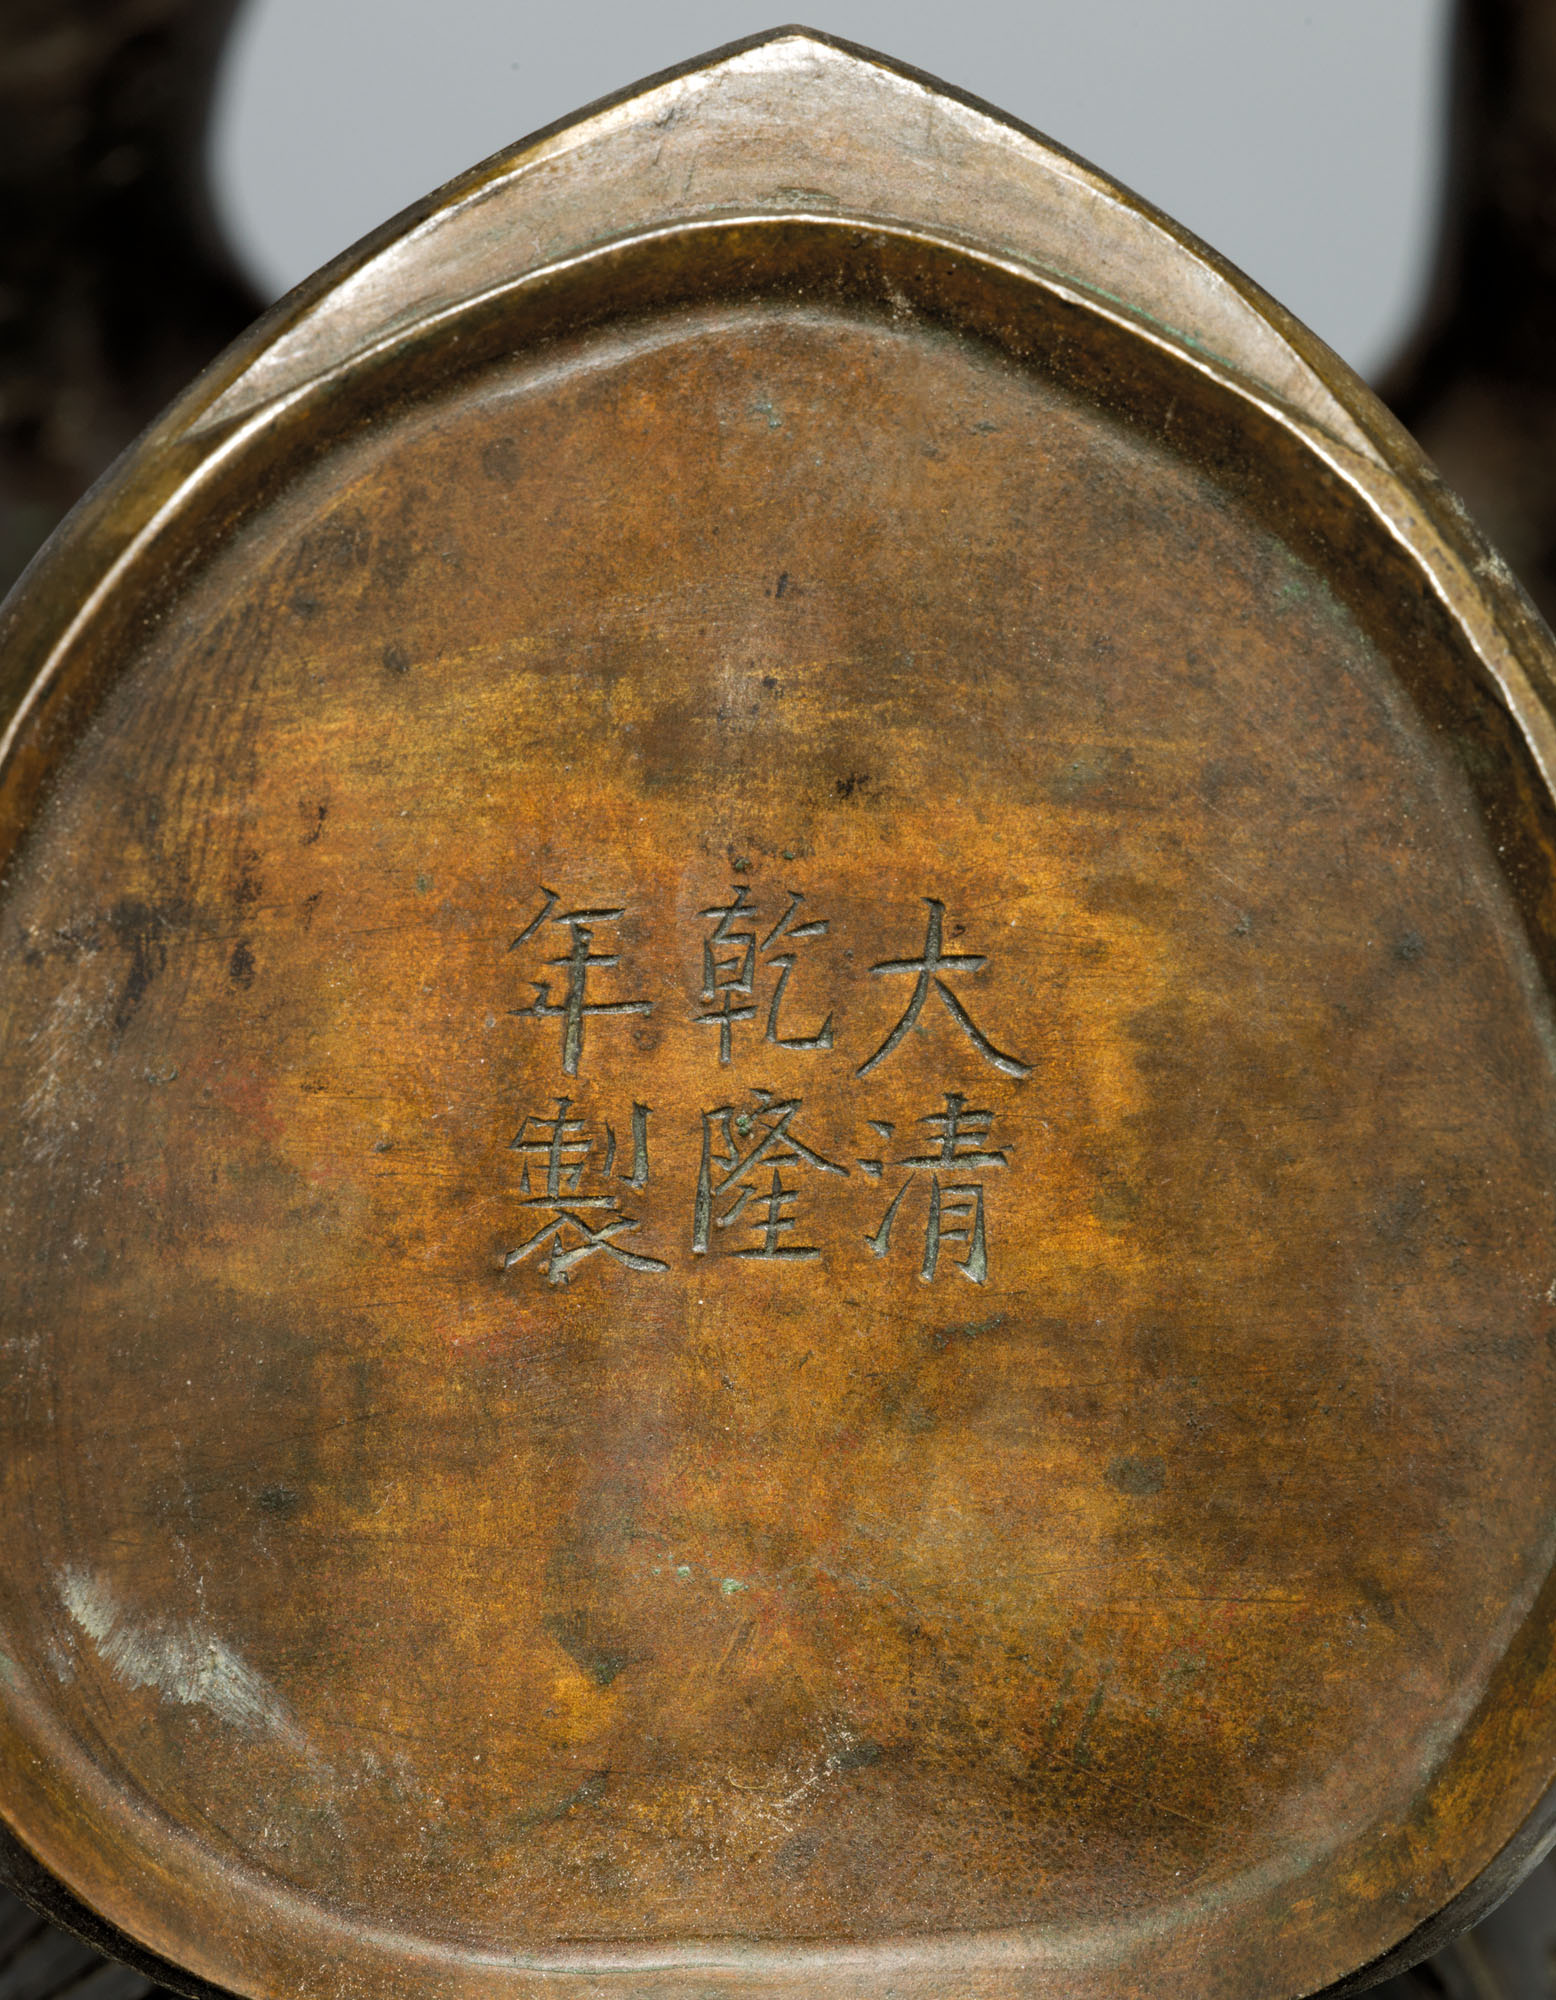 A RARE AND IMPORTANT BRONZE TAPIR-FORM VESSEL, XIZUN